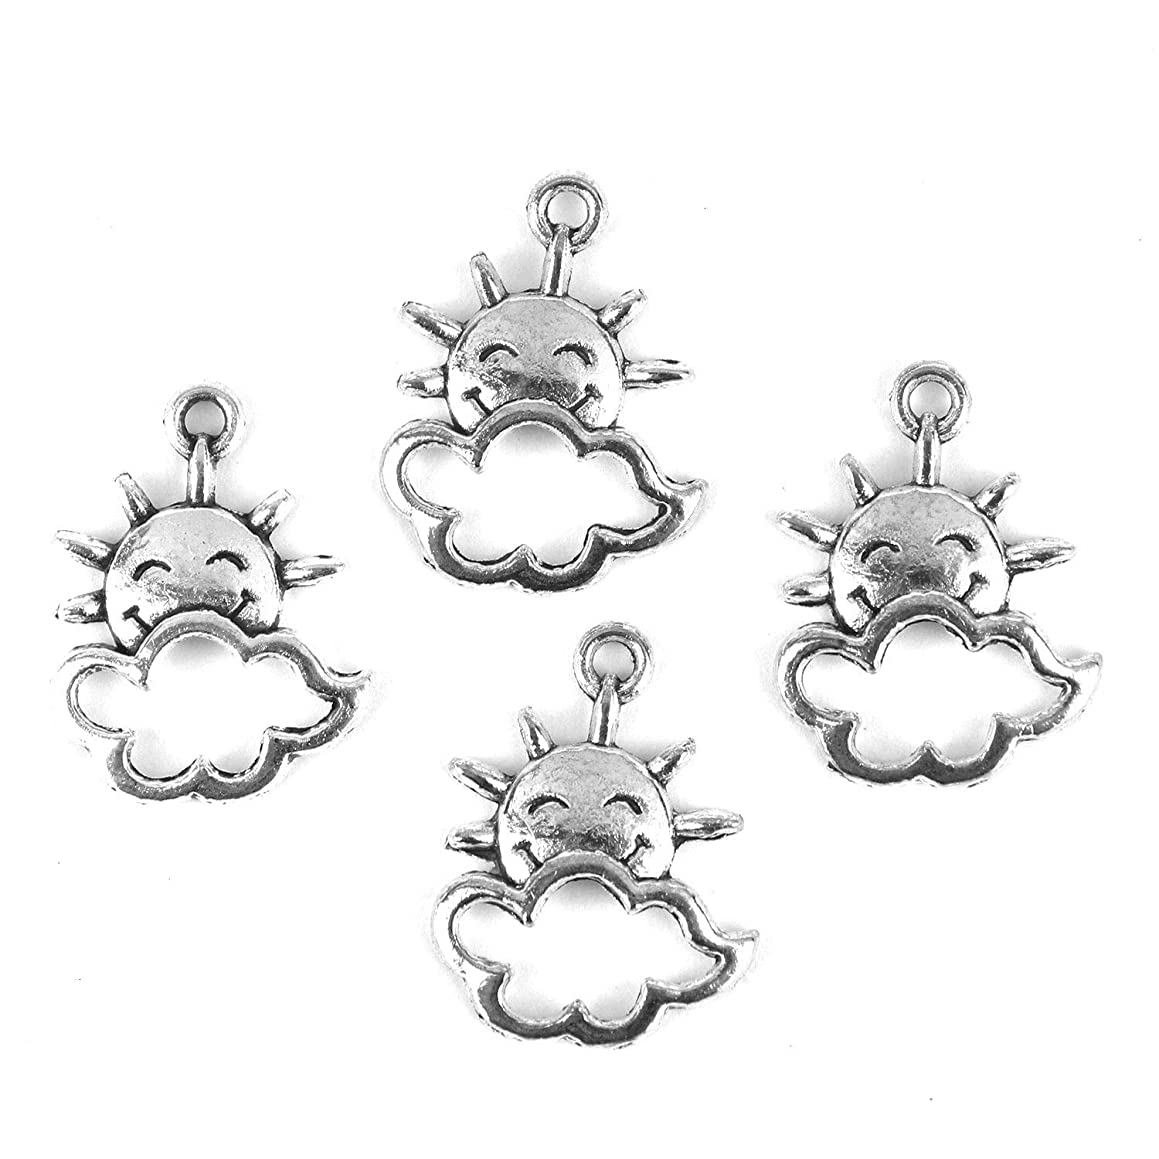 Monrocco 80pcs Antique Vintage Tibetan Silver Sun Cloud Charms Alloy Sun Smile Sun Metal Pendants for Jewelry Making DIY Findings